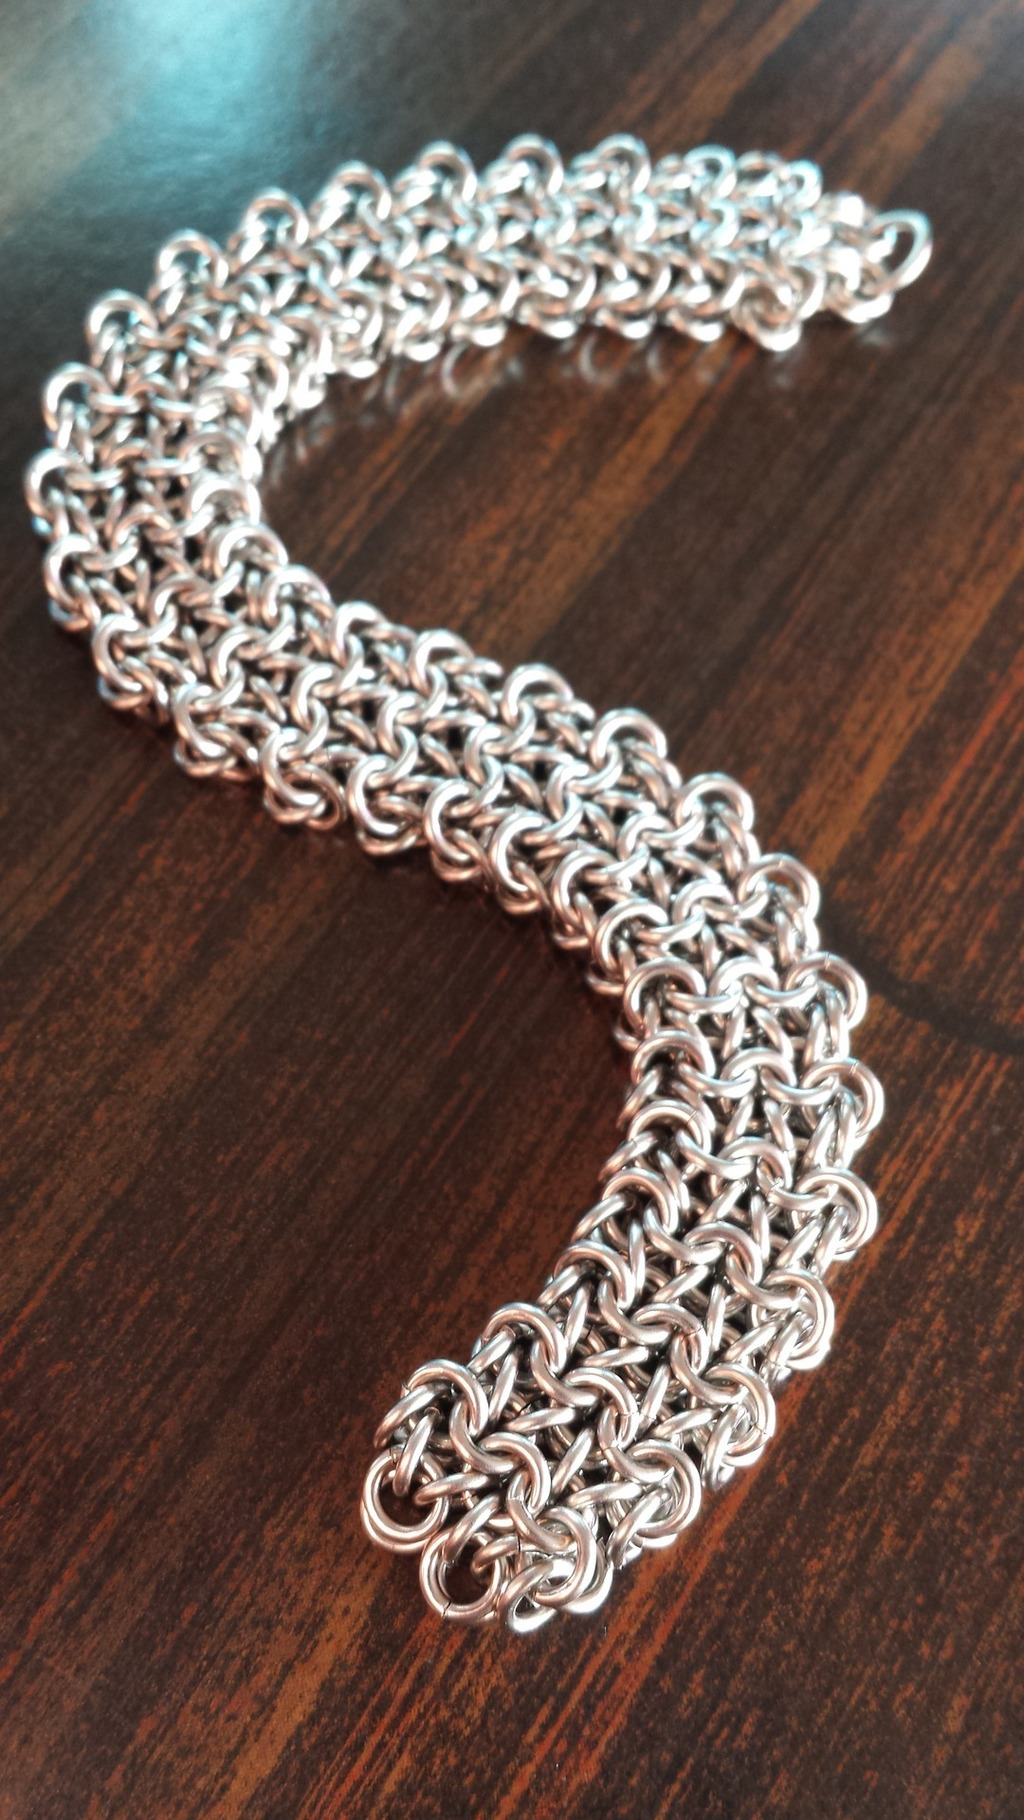 Coyote Weave Bracelet